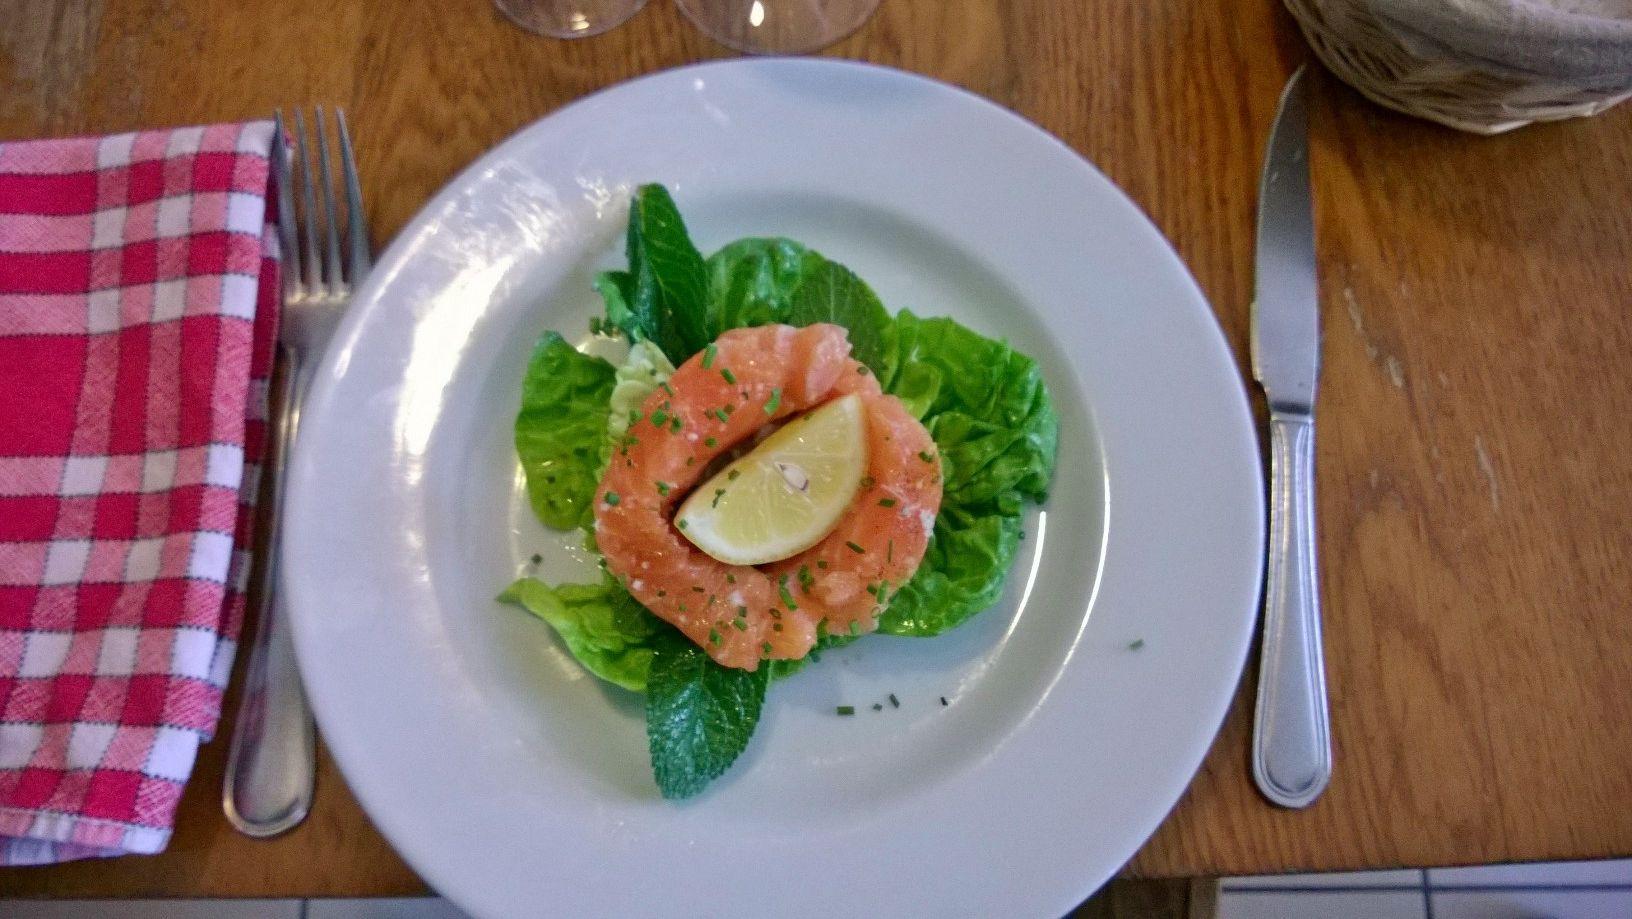 Sashimi de saumon Le Picotin Restaurant Paris 12 | Sashimi saumon, Restaurant paris 12, Sashimi